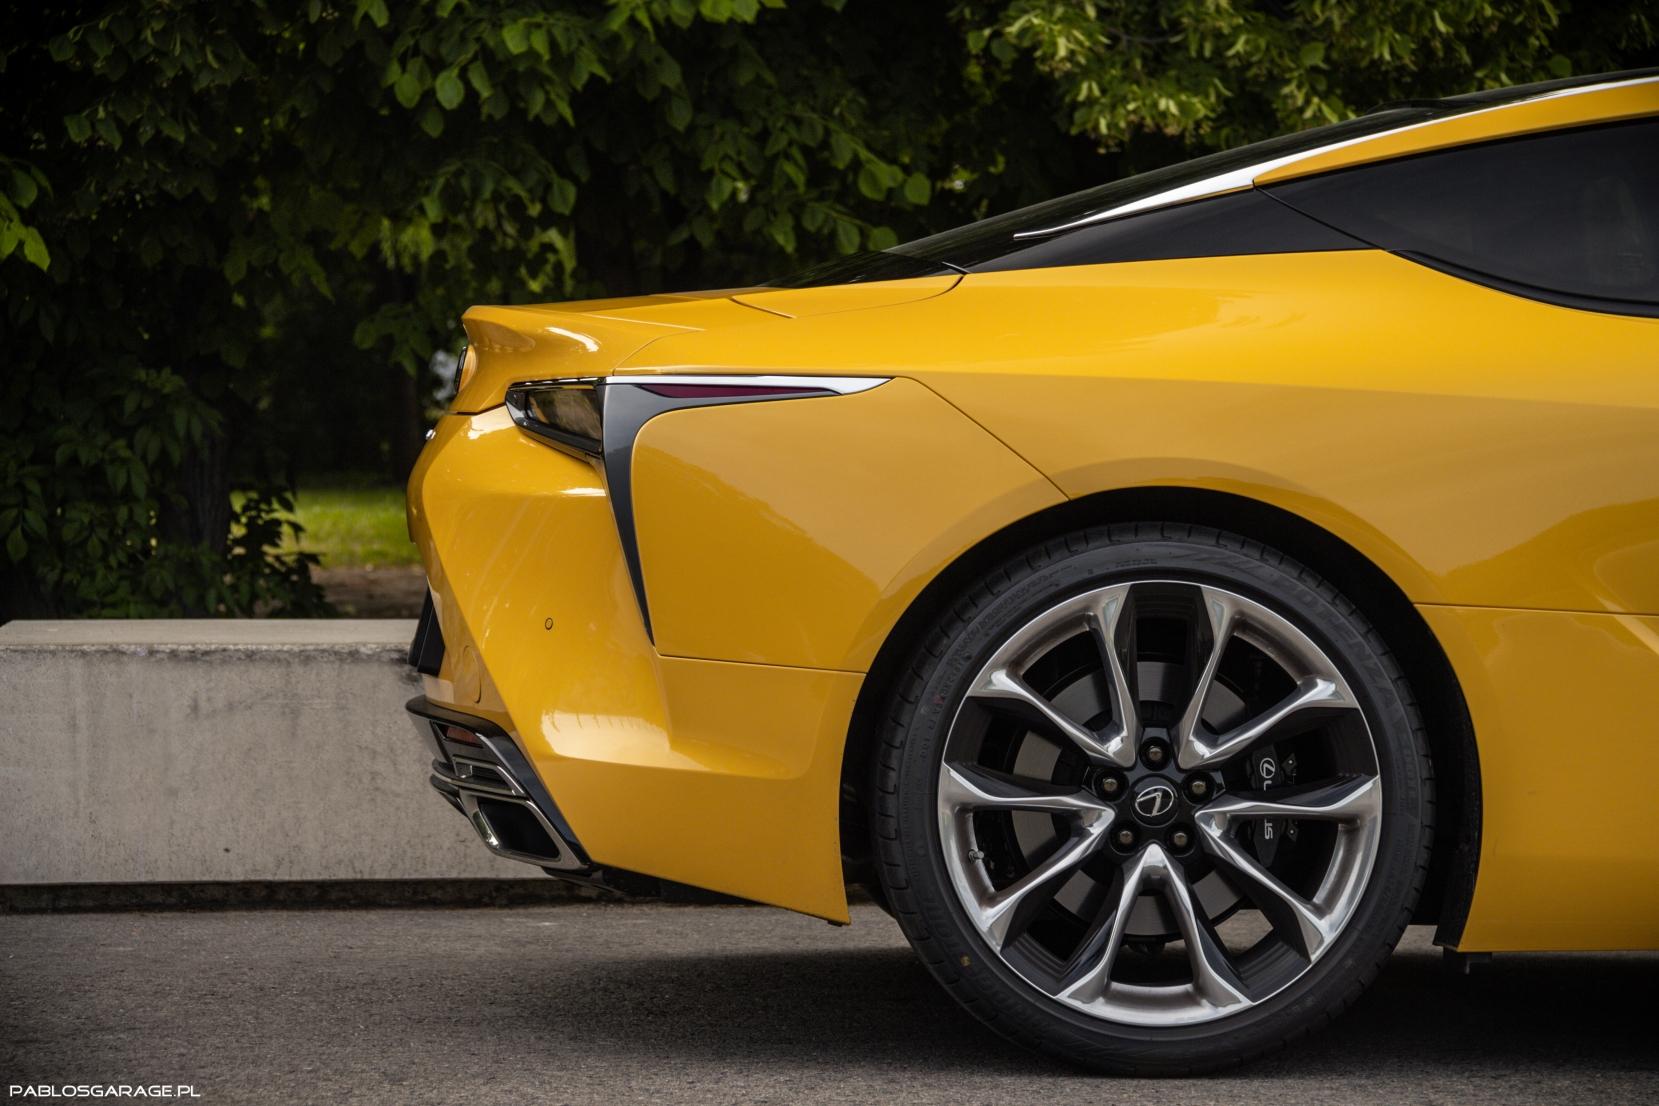 Lexus LC500 5.0 V8 464 KM Yellow Edition